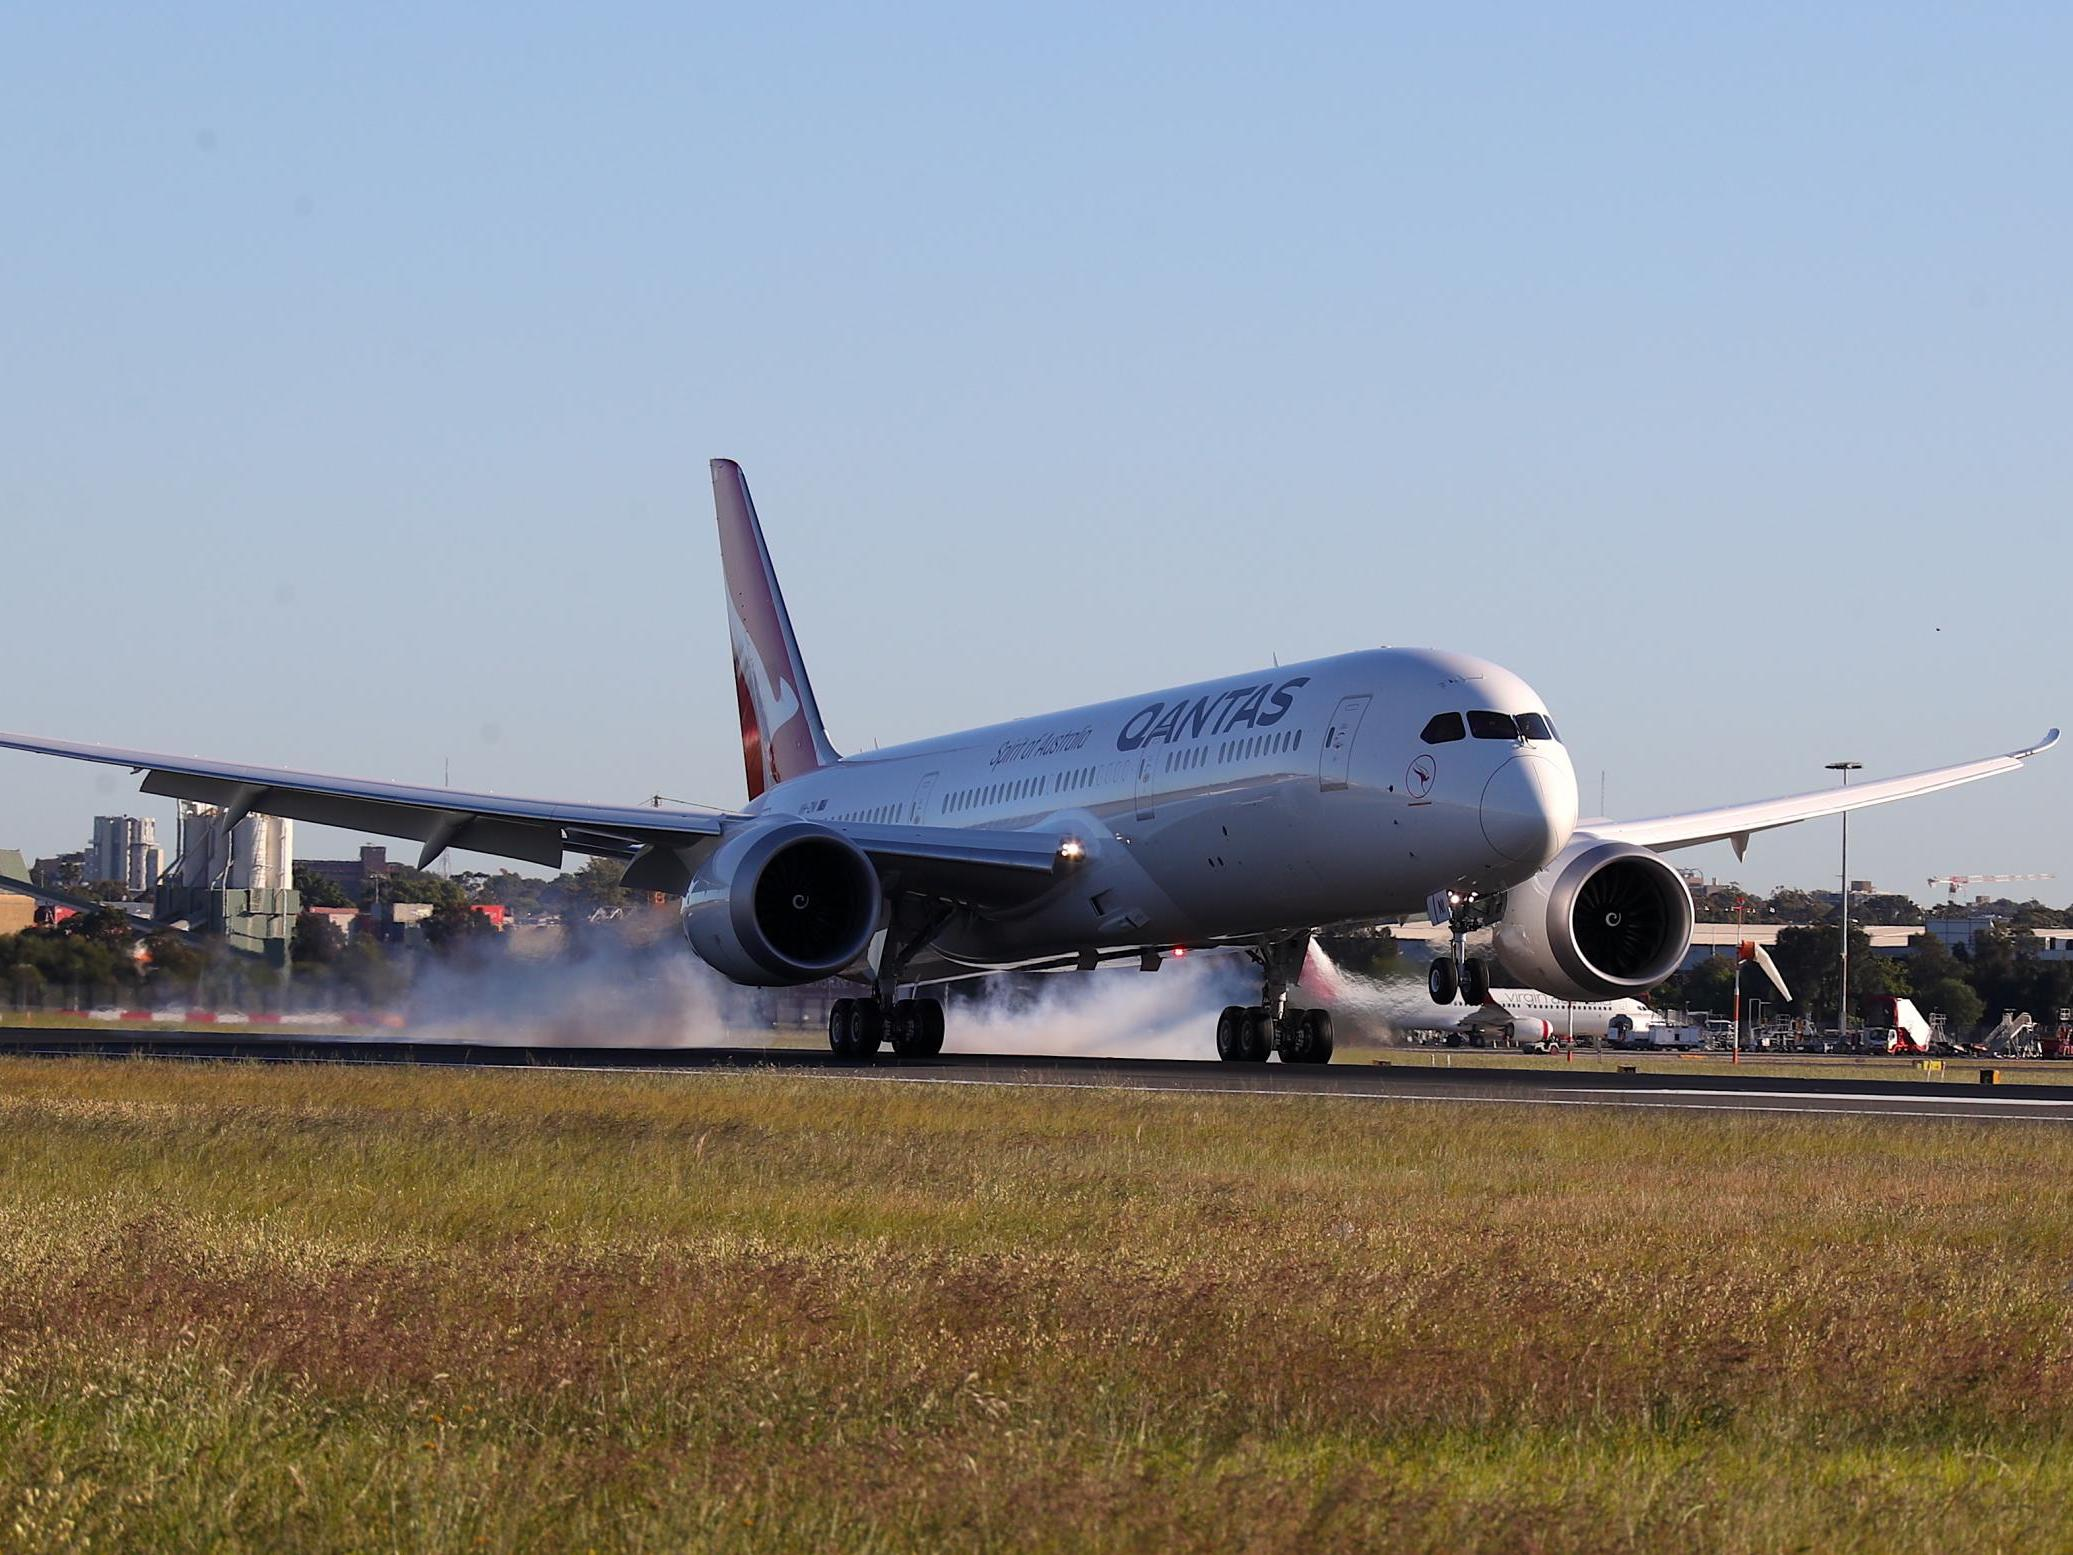 Ultra long-haul: Qantas completes longest non-stop passenger flight in history